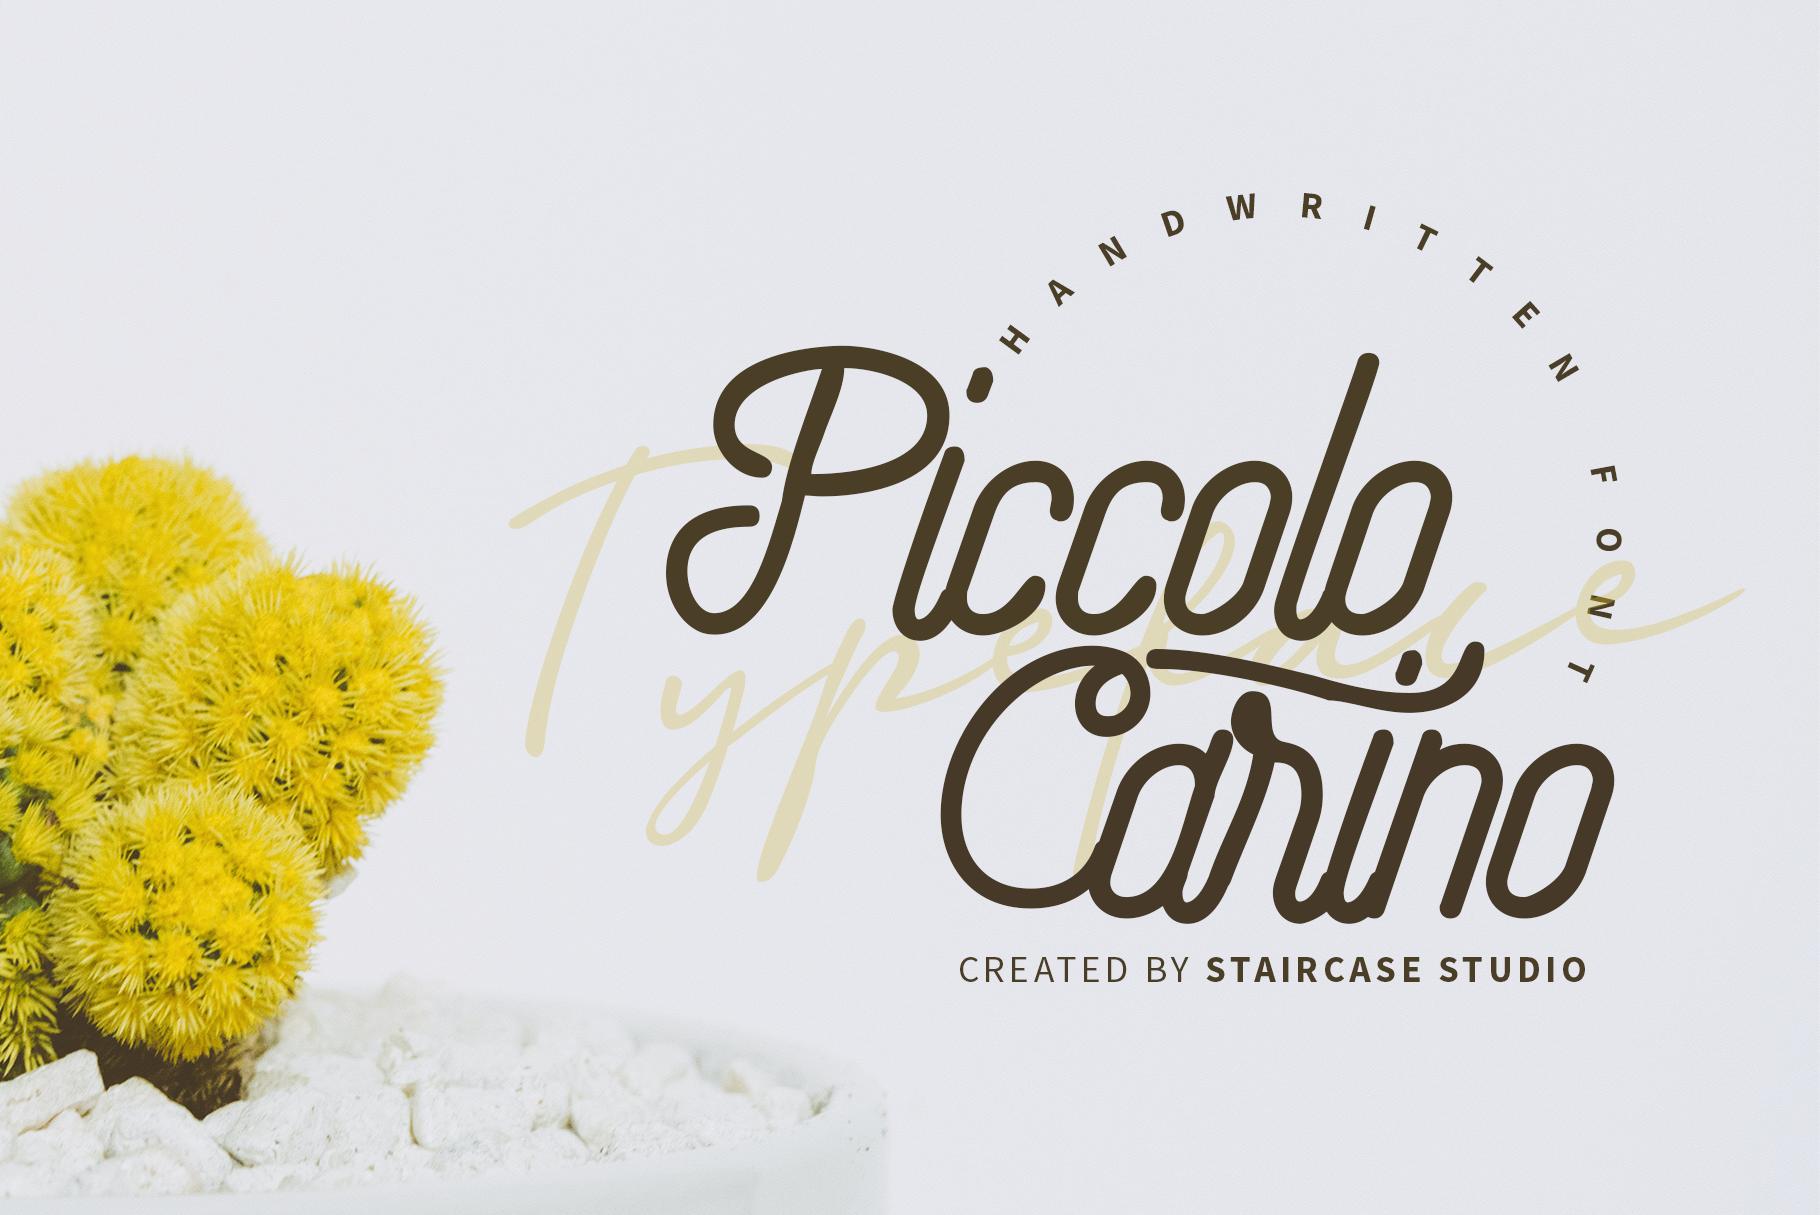 Piccolo Carino Tilted Back